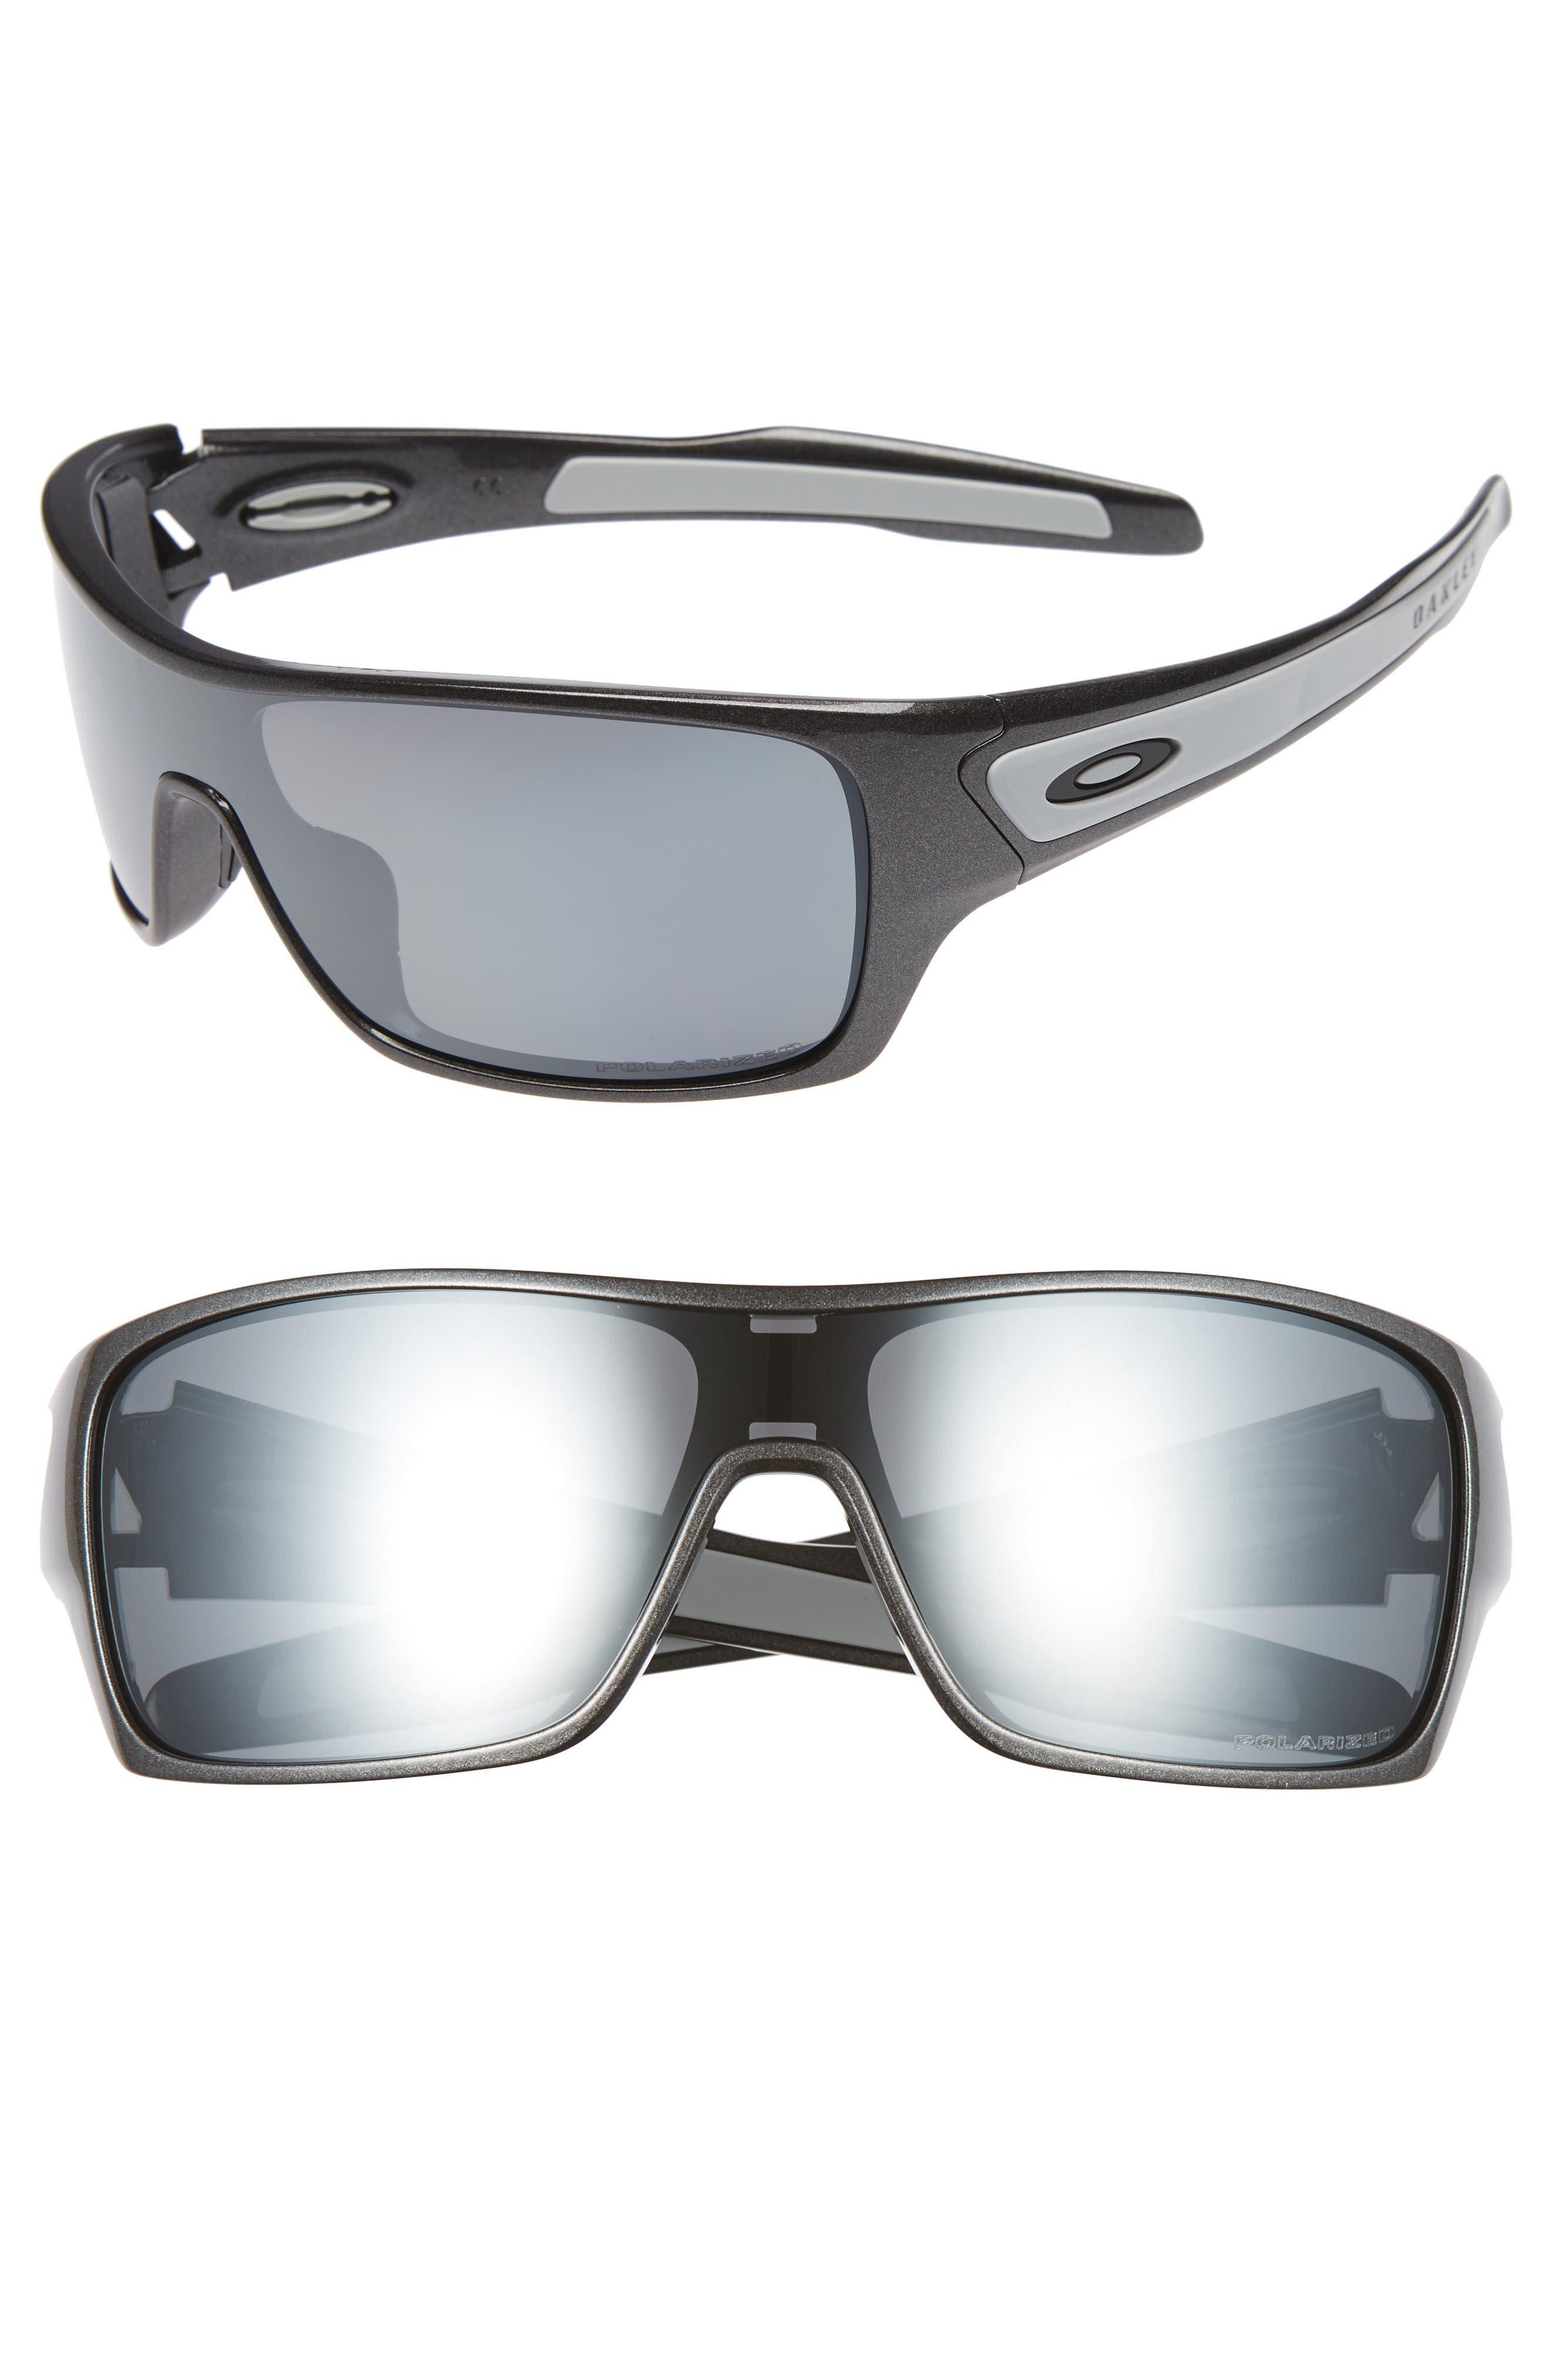 746465ec50 ... black prizm lens mens sunglasses 9263 14  oakley turbine rotor 63mm polarized  sunglasses